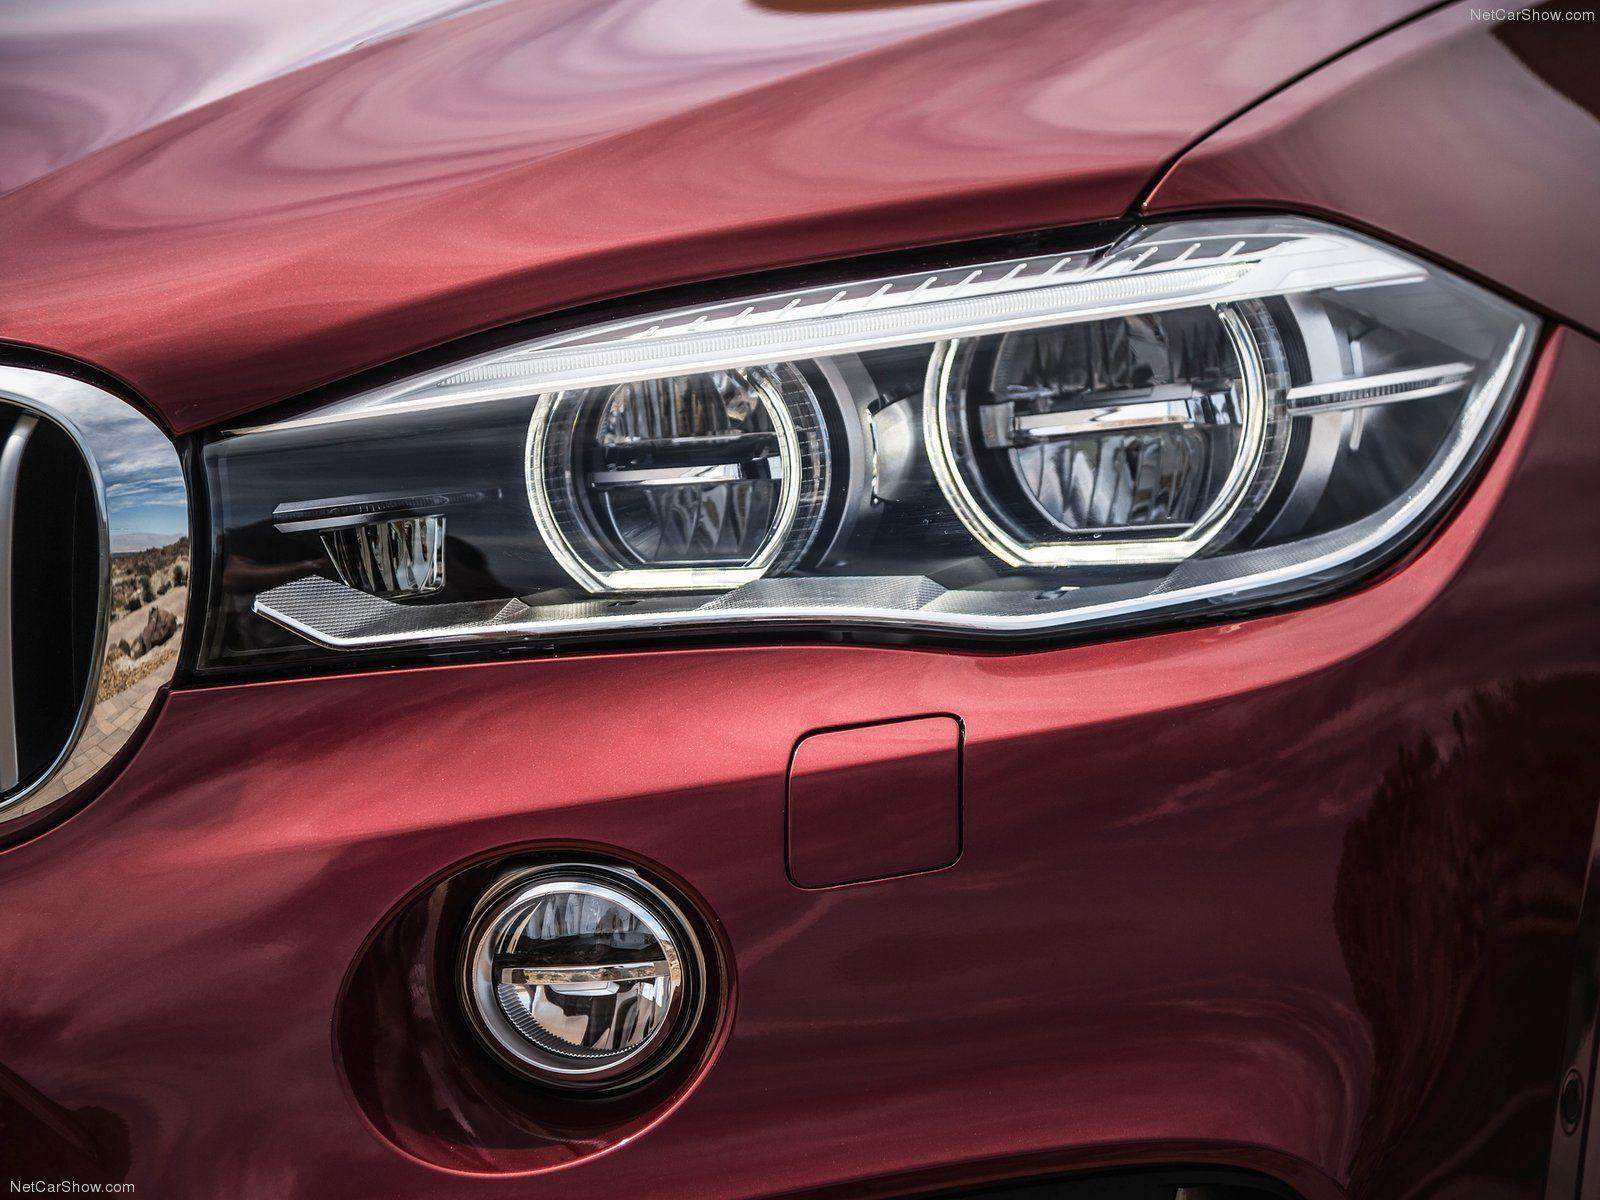 BMW M9 2015 Interior Free Stock Images   Http://wallucky.com/